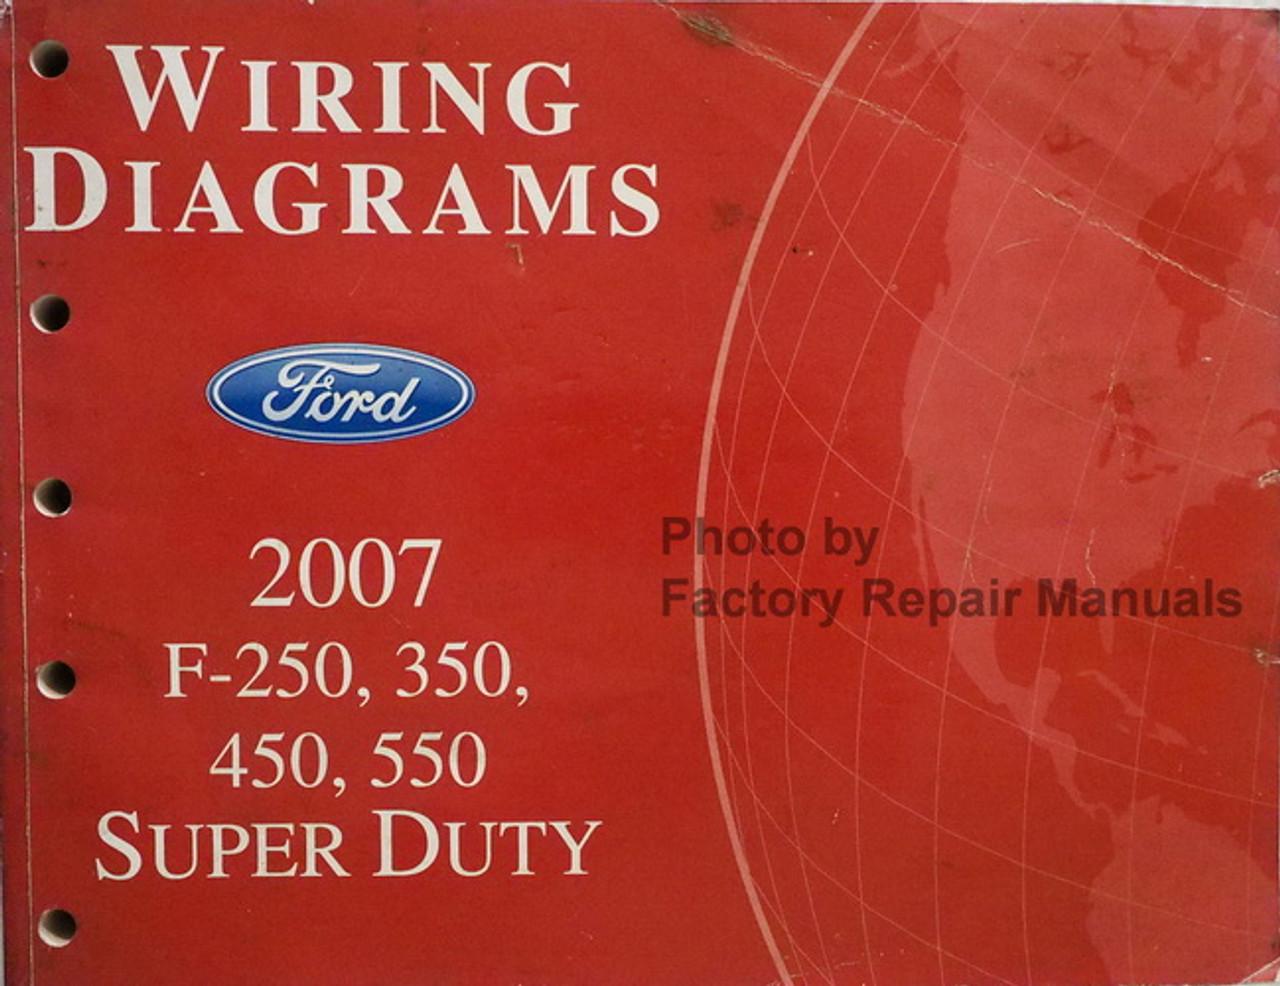 [SCHEMATICS_4LK]  2007 Ford F250 F350 F450 F550 Super Duty Electrical Wiring Diagrams -  Factory Repair Manuals | Wiring Diagram For Ford F250 |  | Factory Repair Manuals